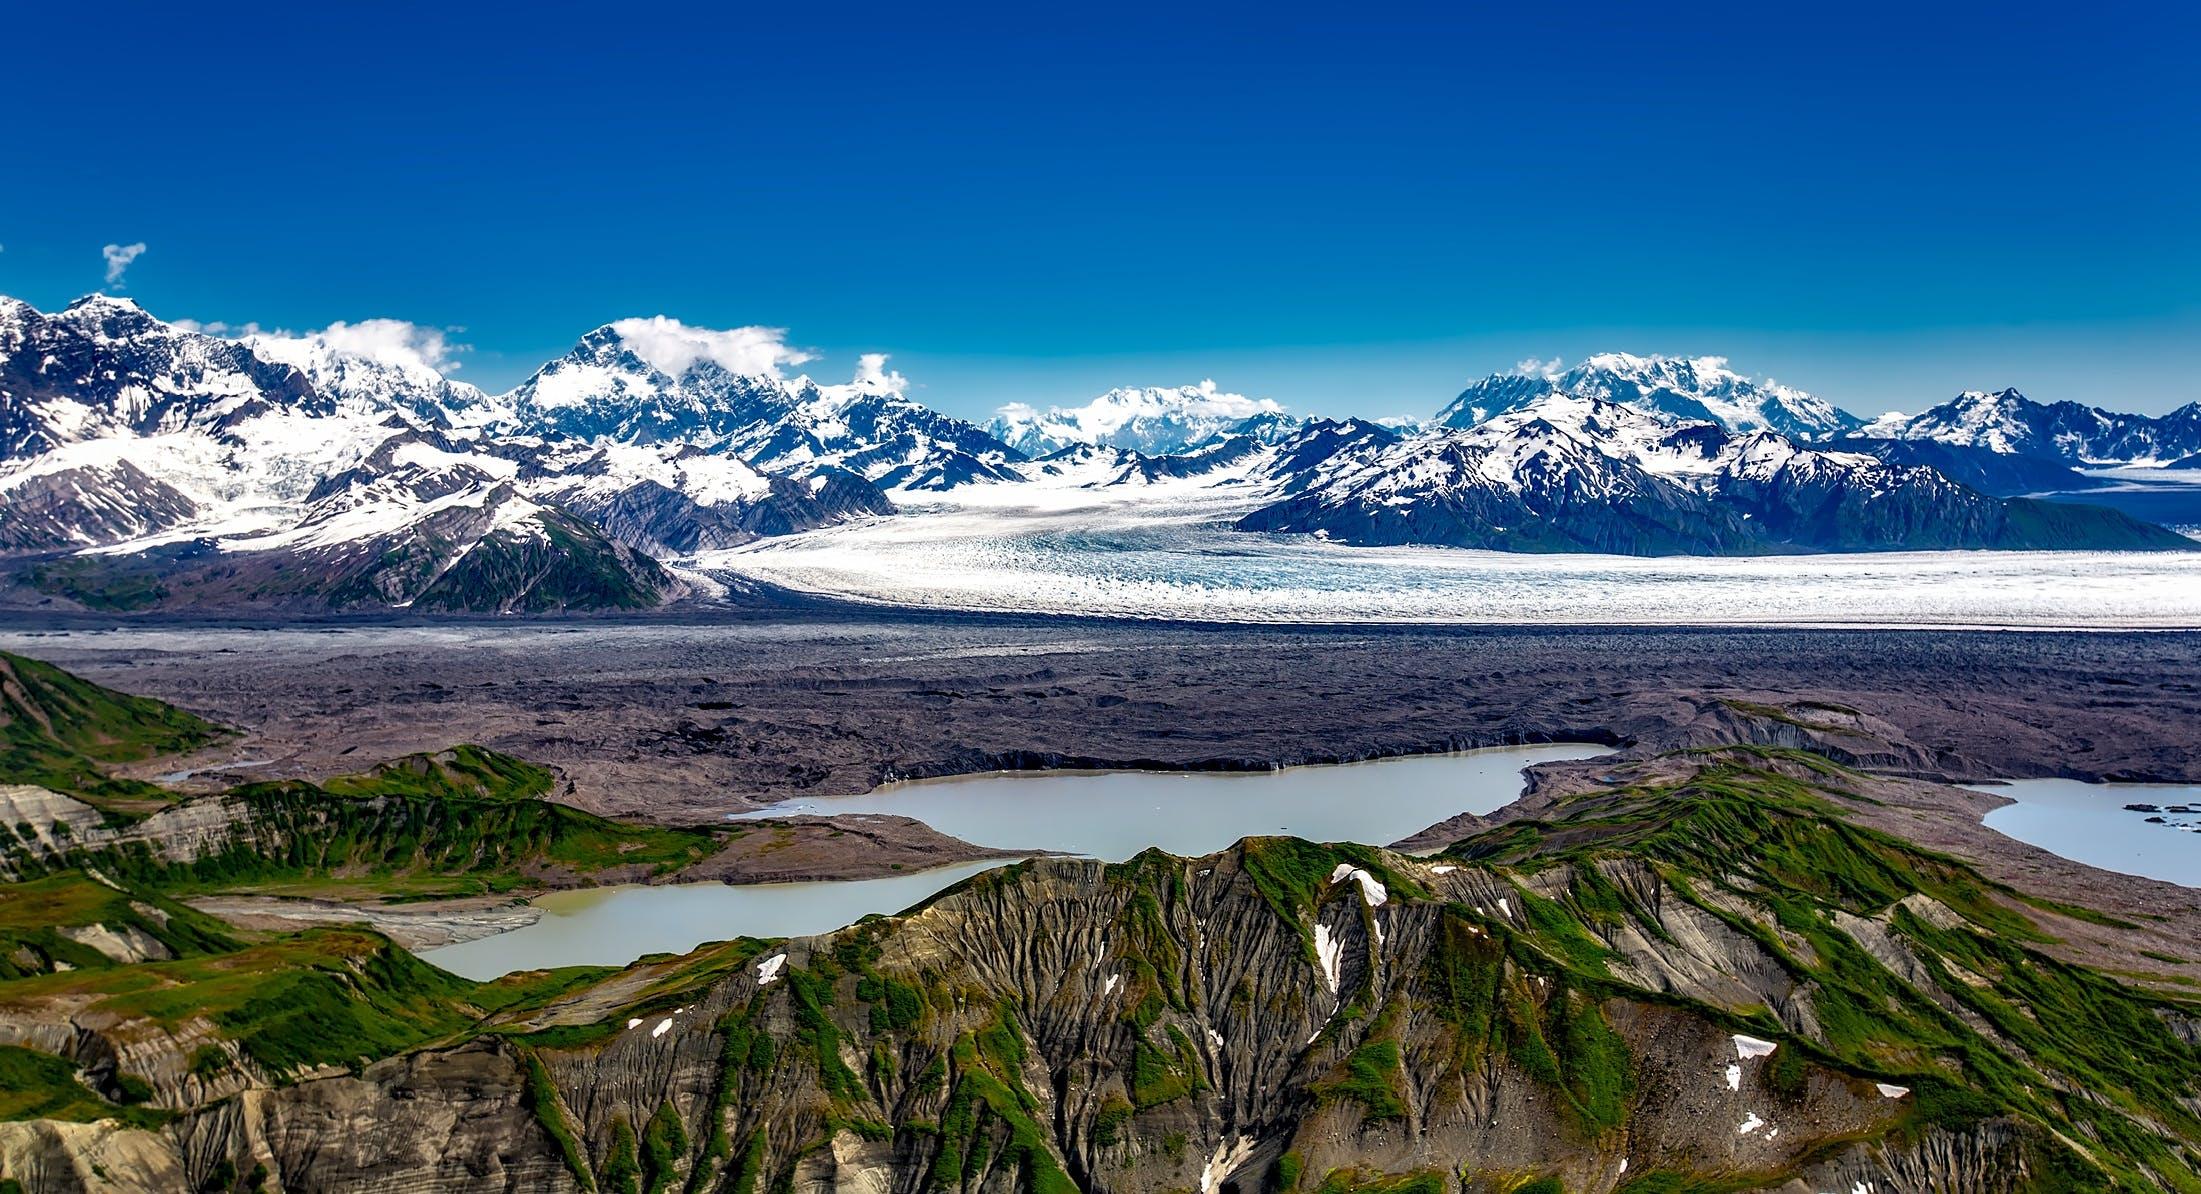 Kostenloses Stock Foto zu berge, fels, gebirge, gletscher